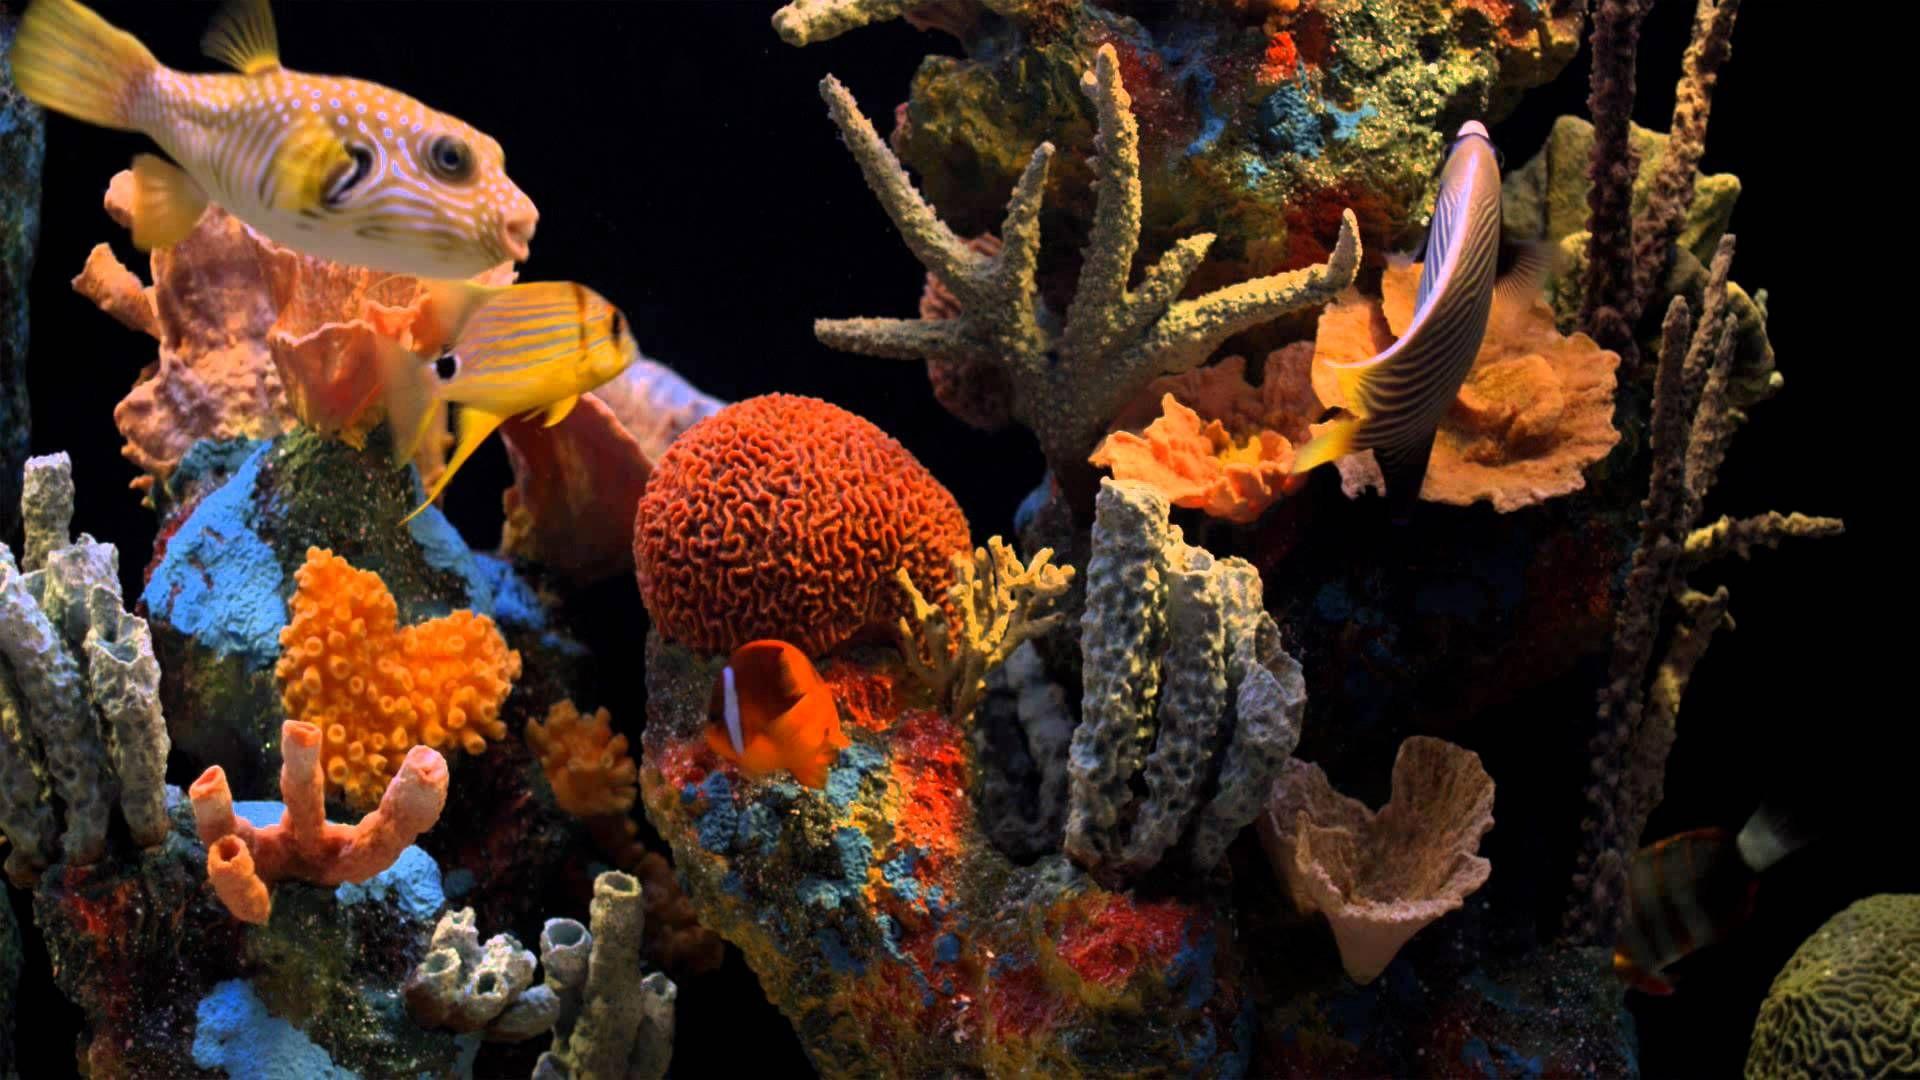 Akvaryum Aquarium Fish Tank 1080p Full HD Maple